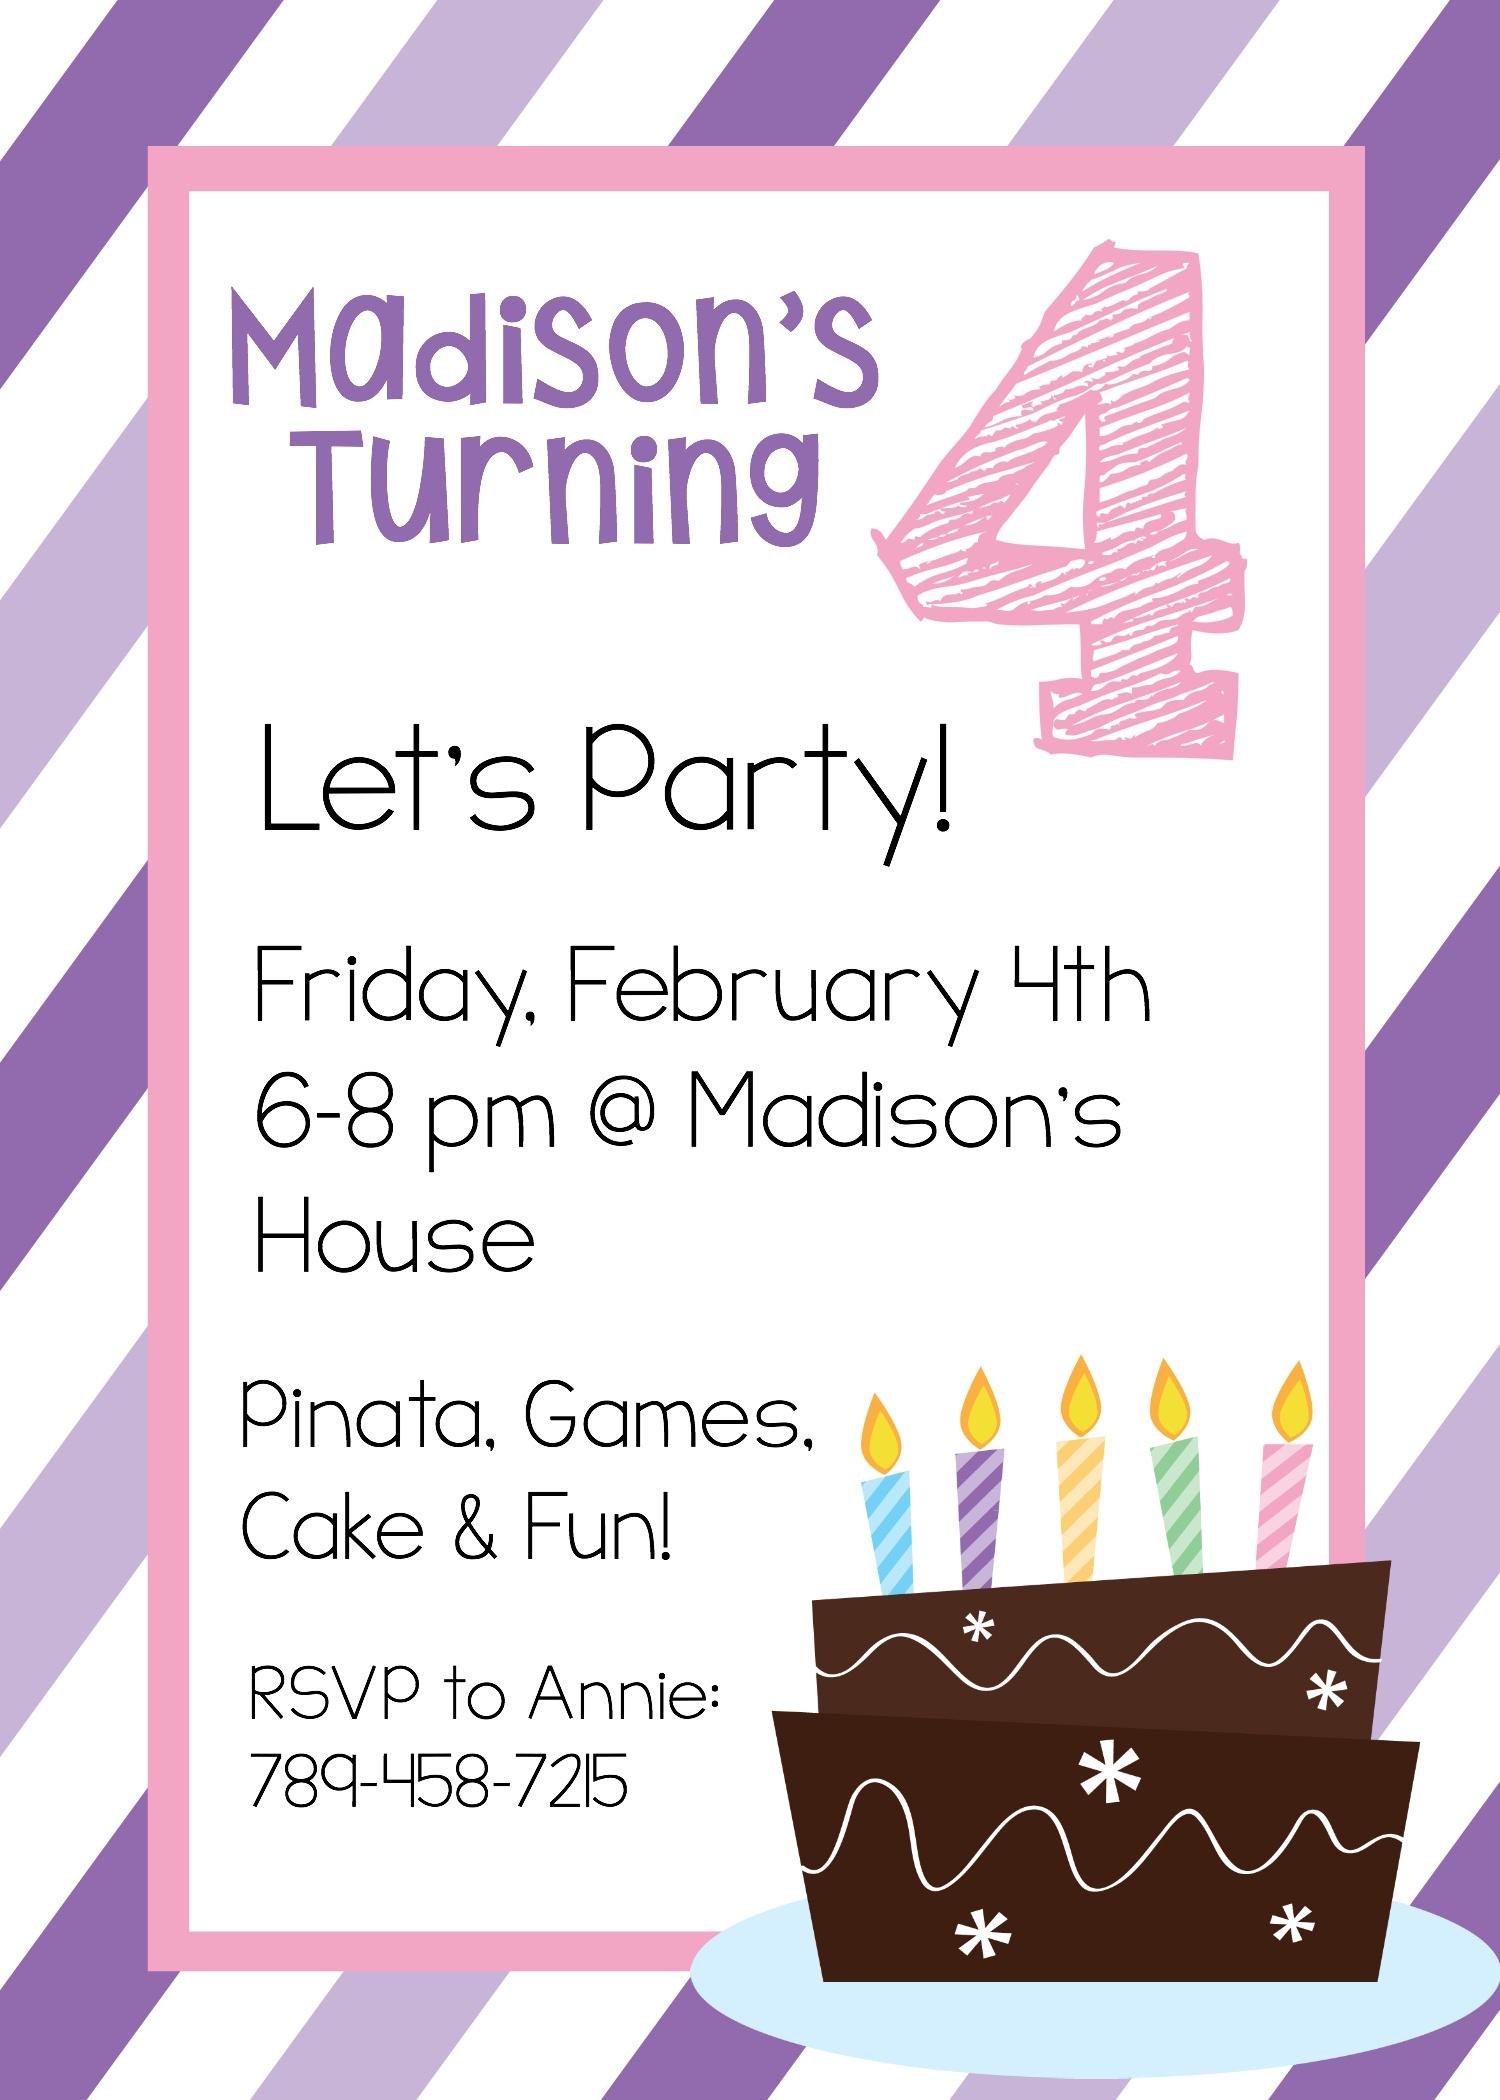 Free Printable Birthday Invitation Templates - Free Printable Birthday Party Invitations